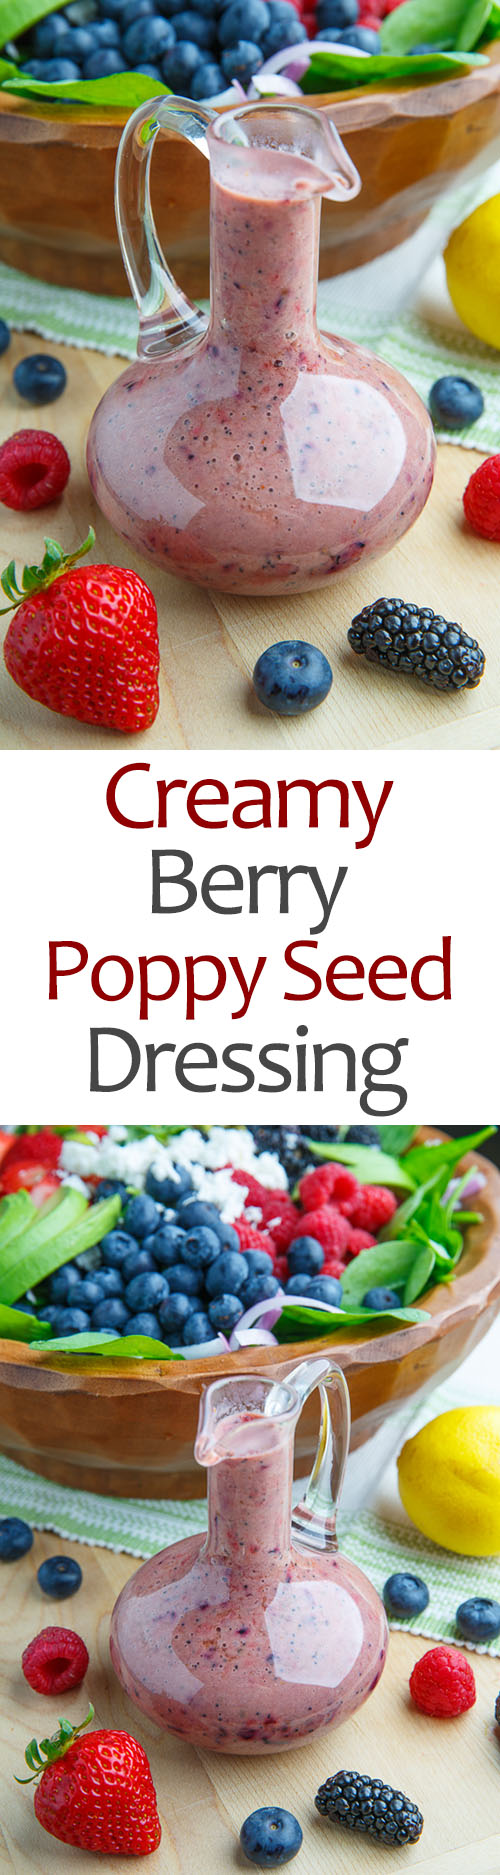 Creamy Berry Poppy Seed Dressing